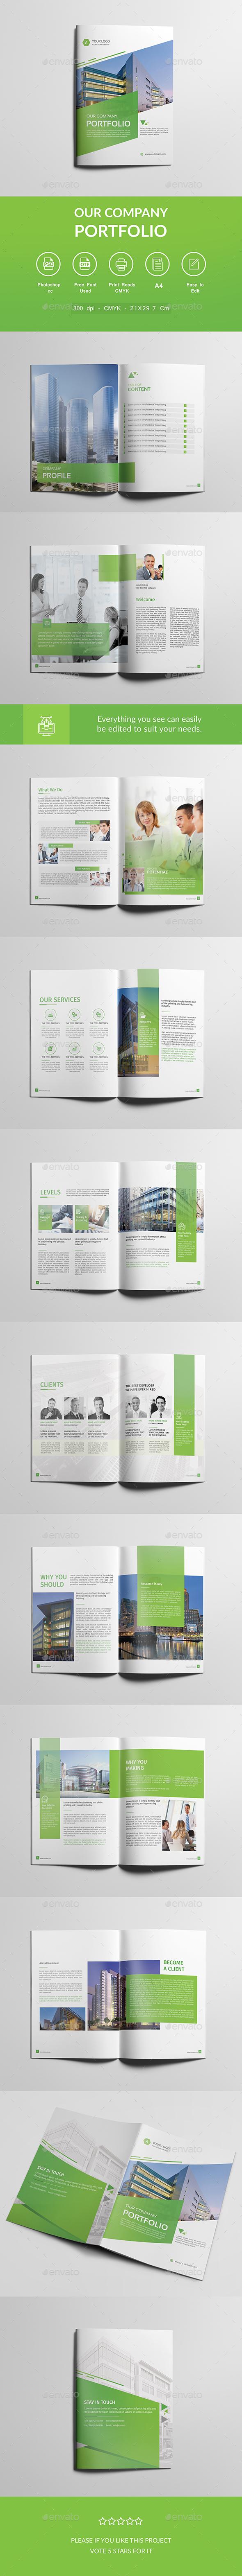 Company Profile Brochure Psd Template Green Portfolio Corporate Brochure Design Brochure Design Template Company Profile Design